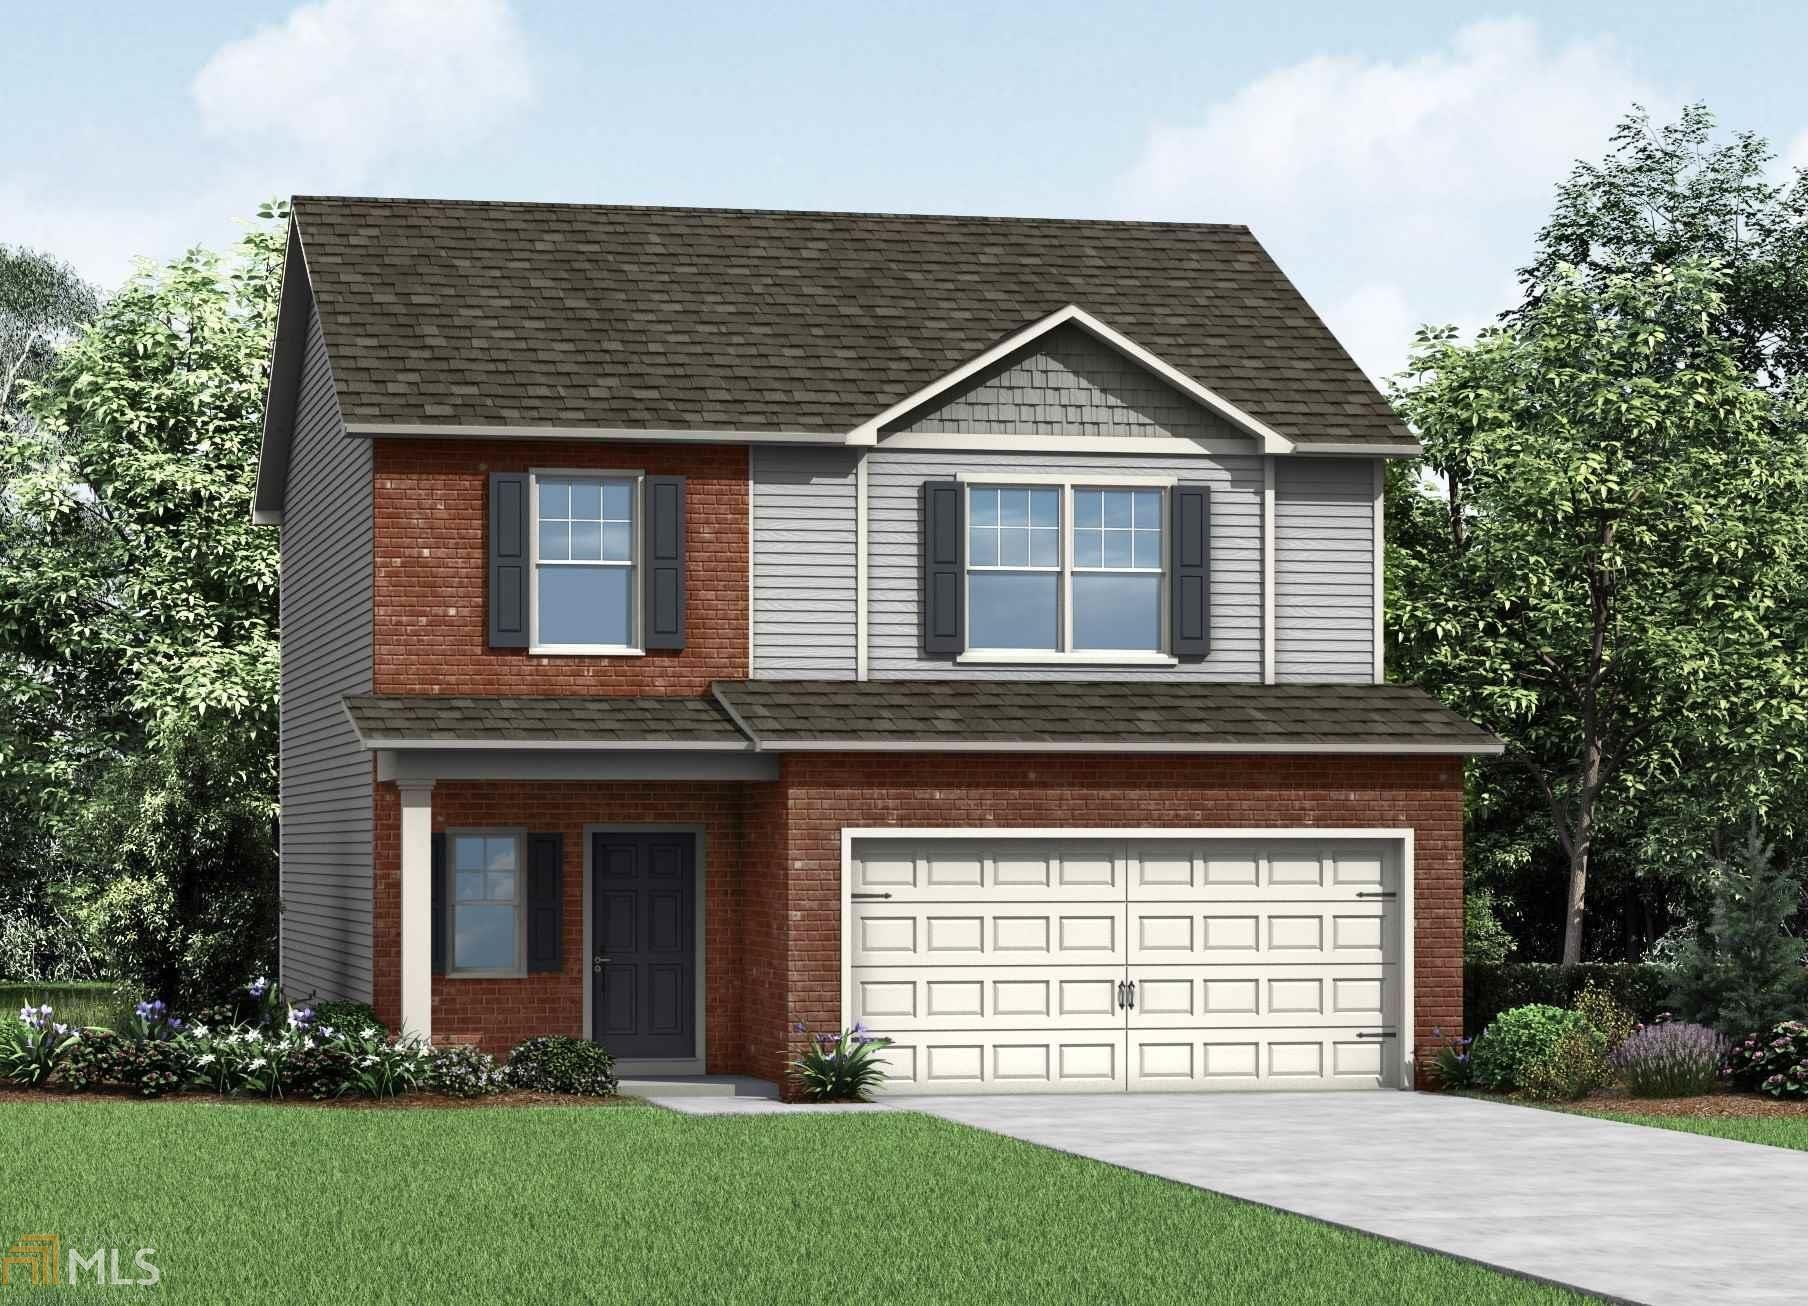 11409 Kilpatrick, Hampton, GA 30228 - #: 8885207